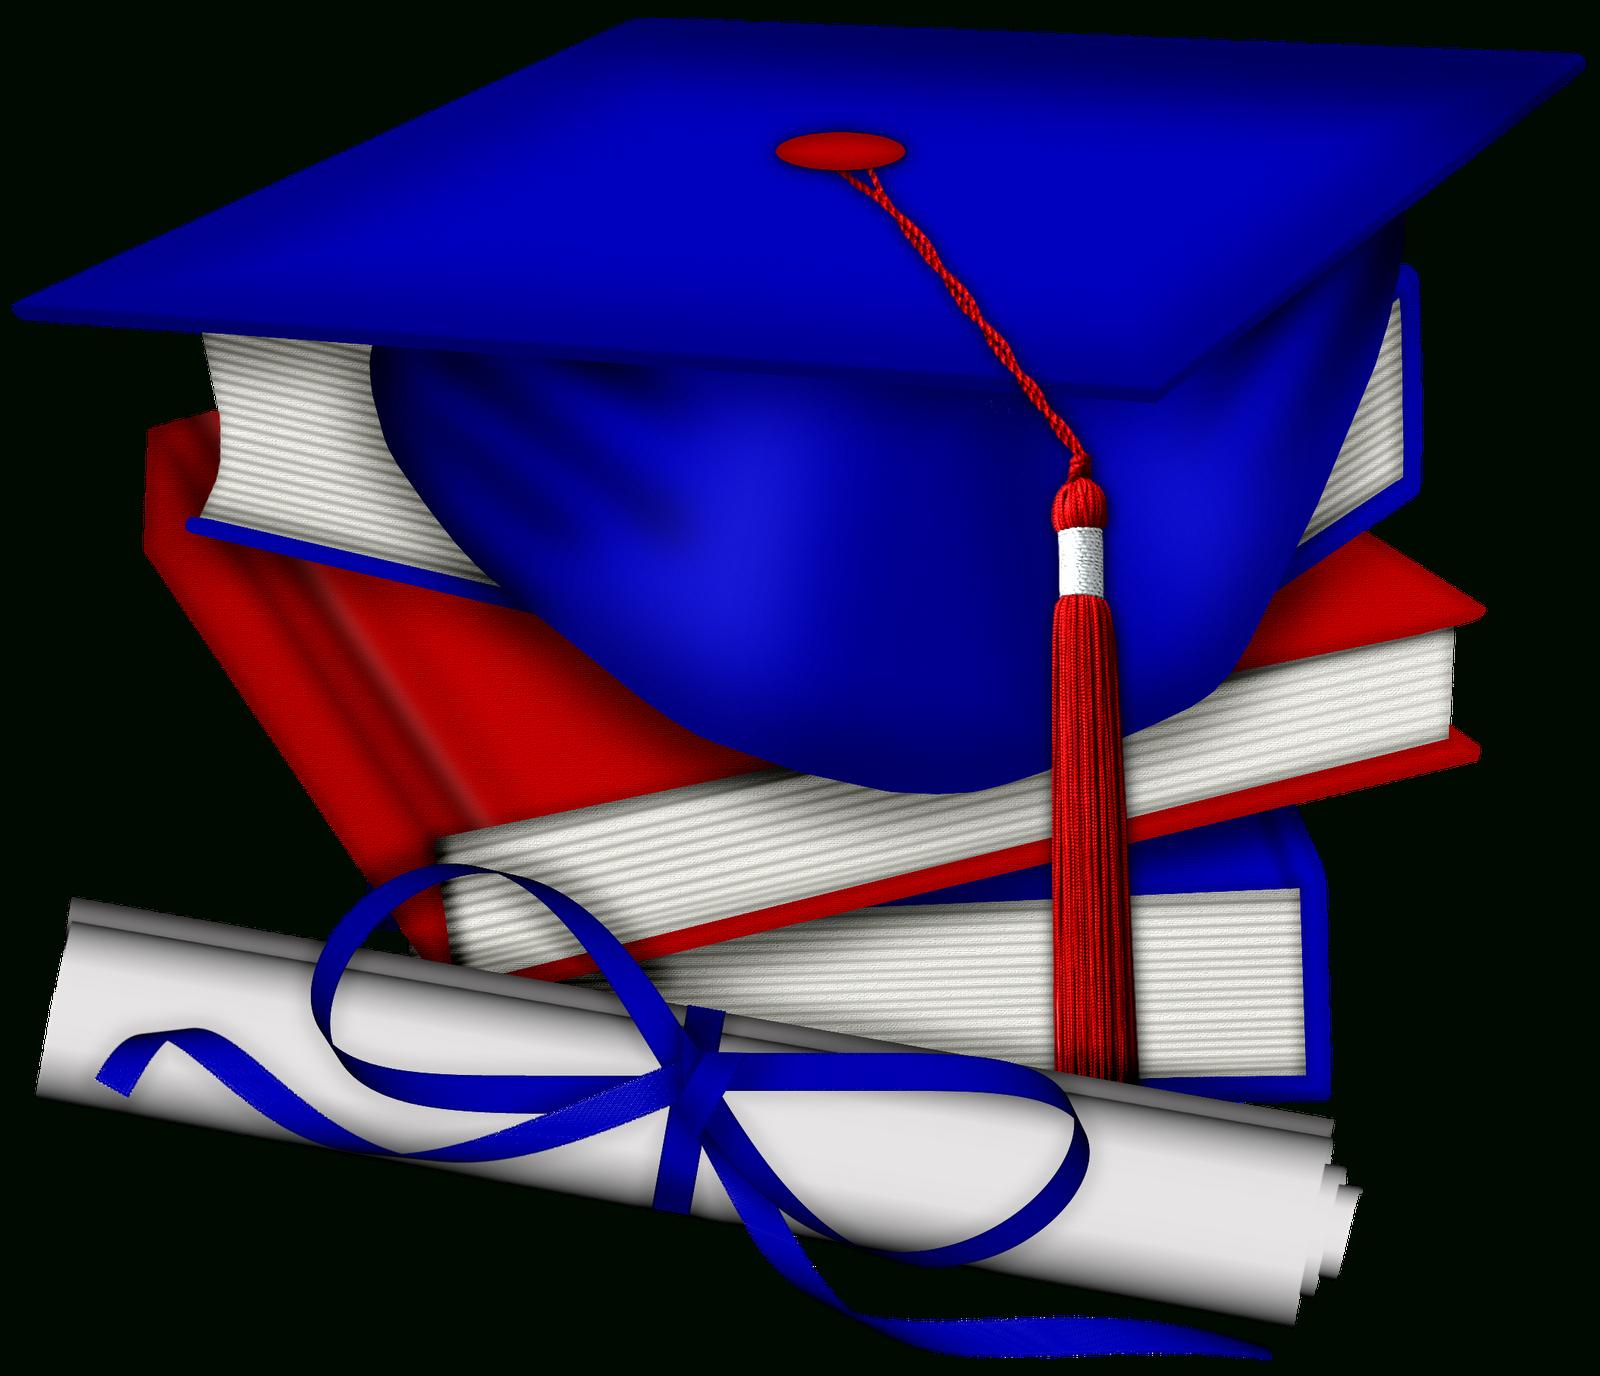 Free Graduation Cliparts, Download Free Clip Art, Free Clip Art On - Graduation Clip Art Free Printable